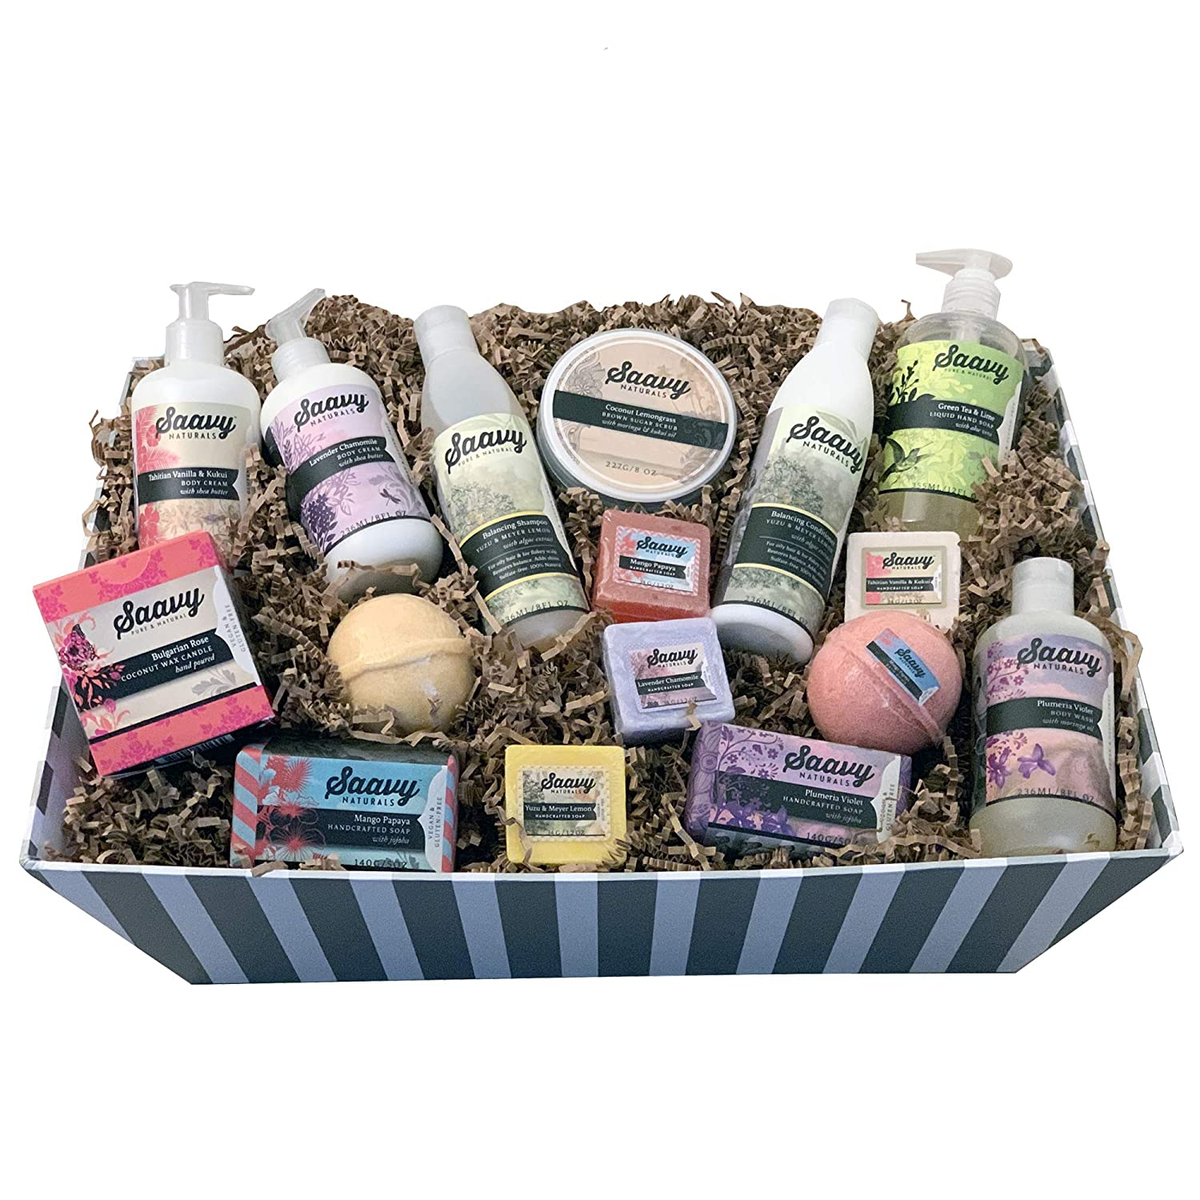 Savvy Naturals Ultimate Spa Gift Basket